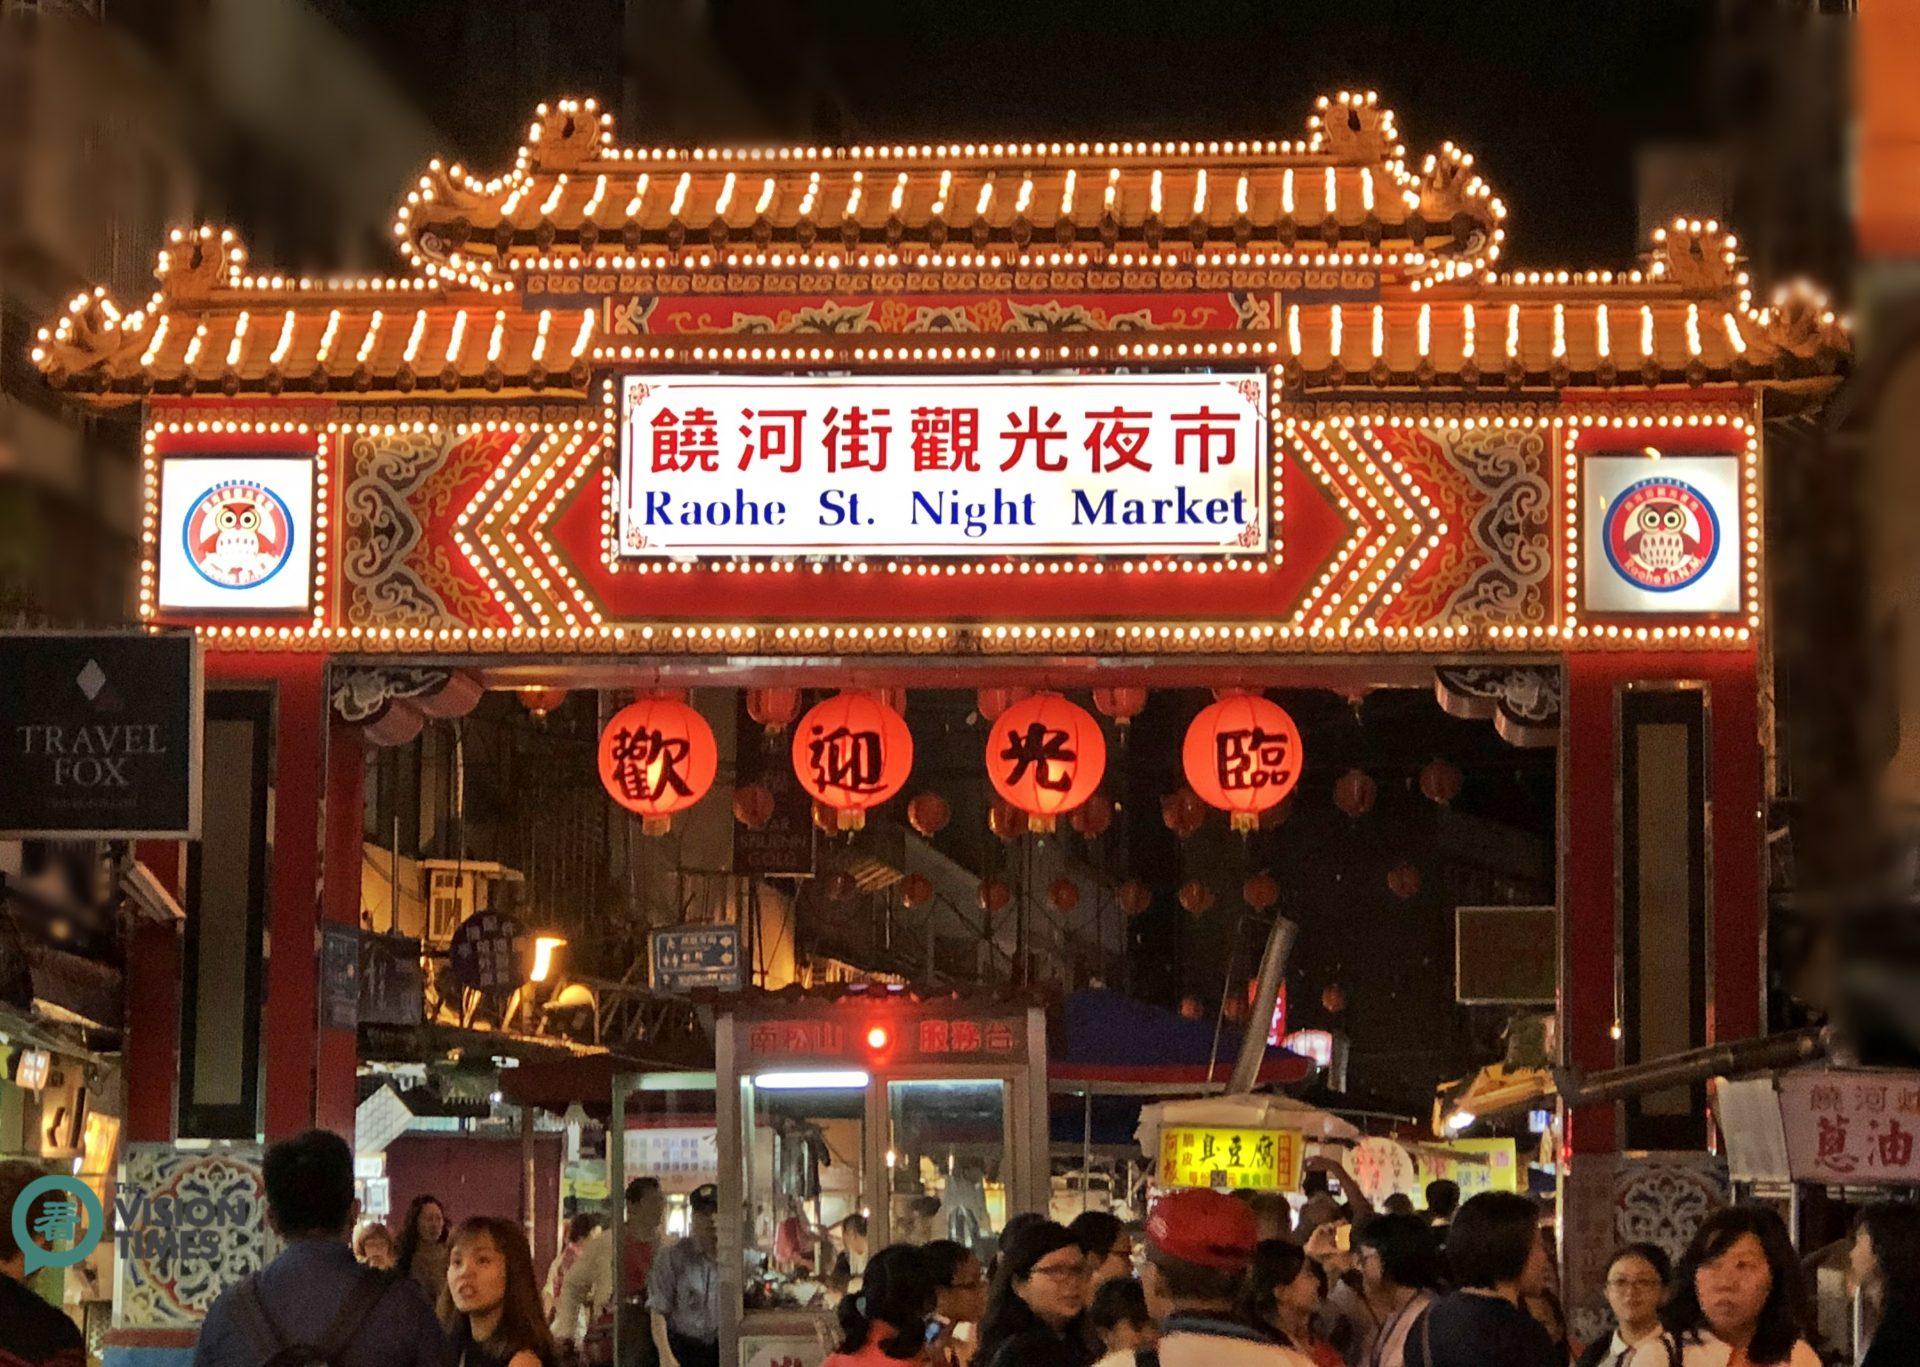 The famlus Raohe St. Night Market in Taipei City. (Image: Billy Shyu / Vision Times)